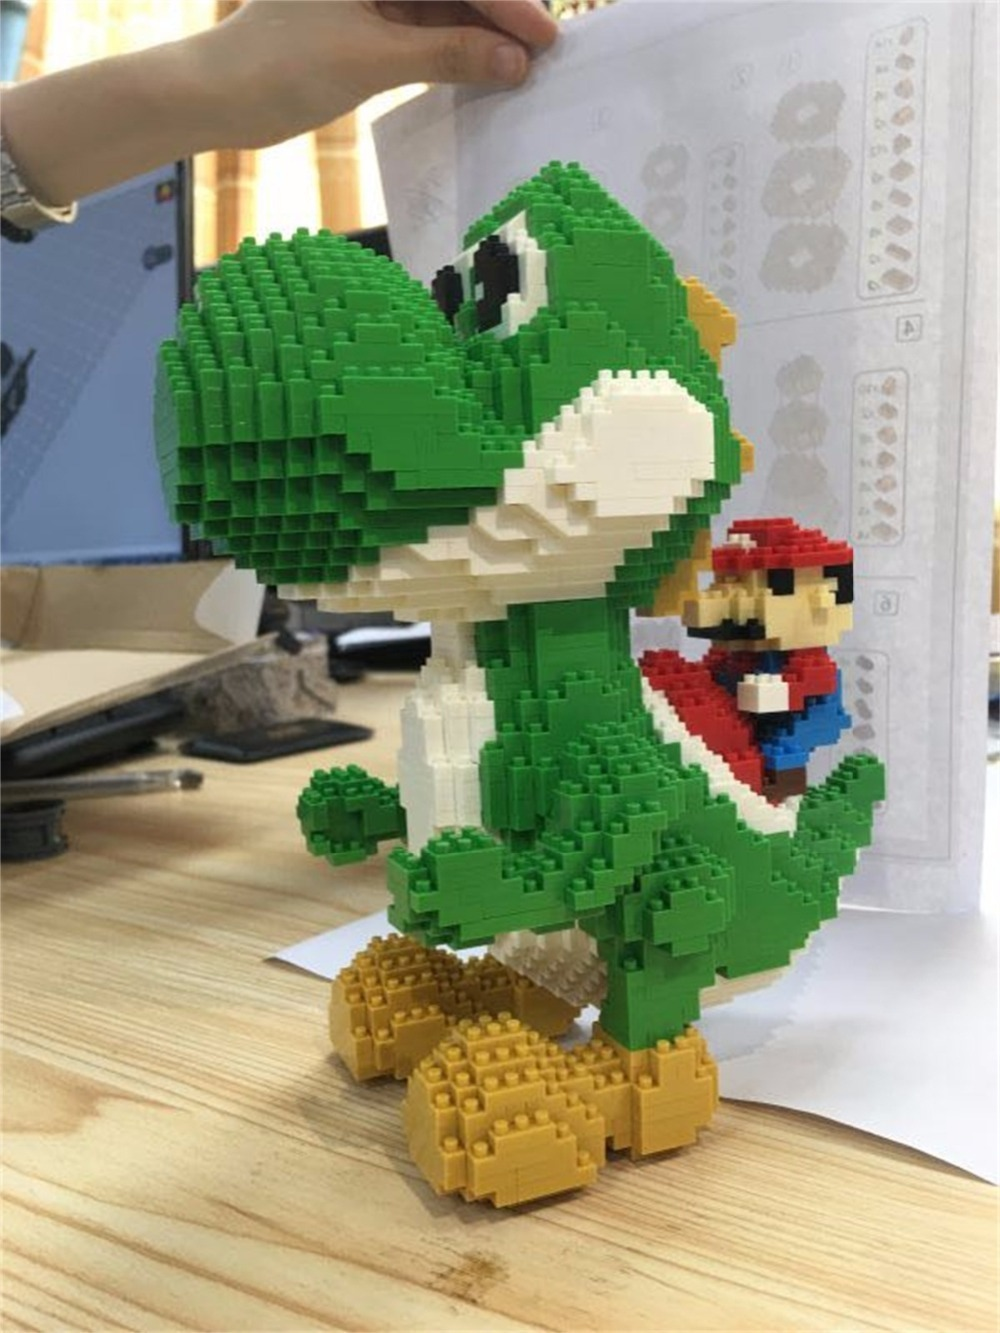 Bloques mágicos HC, Mini bloques de tamaño grande, Micro bloques de Mario, Anime, Juguetes de construcción DIY, Juguetes modelo de subasta, Juguetes para niños, regalos 9020